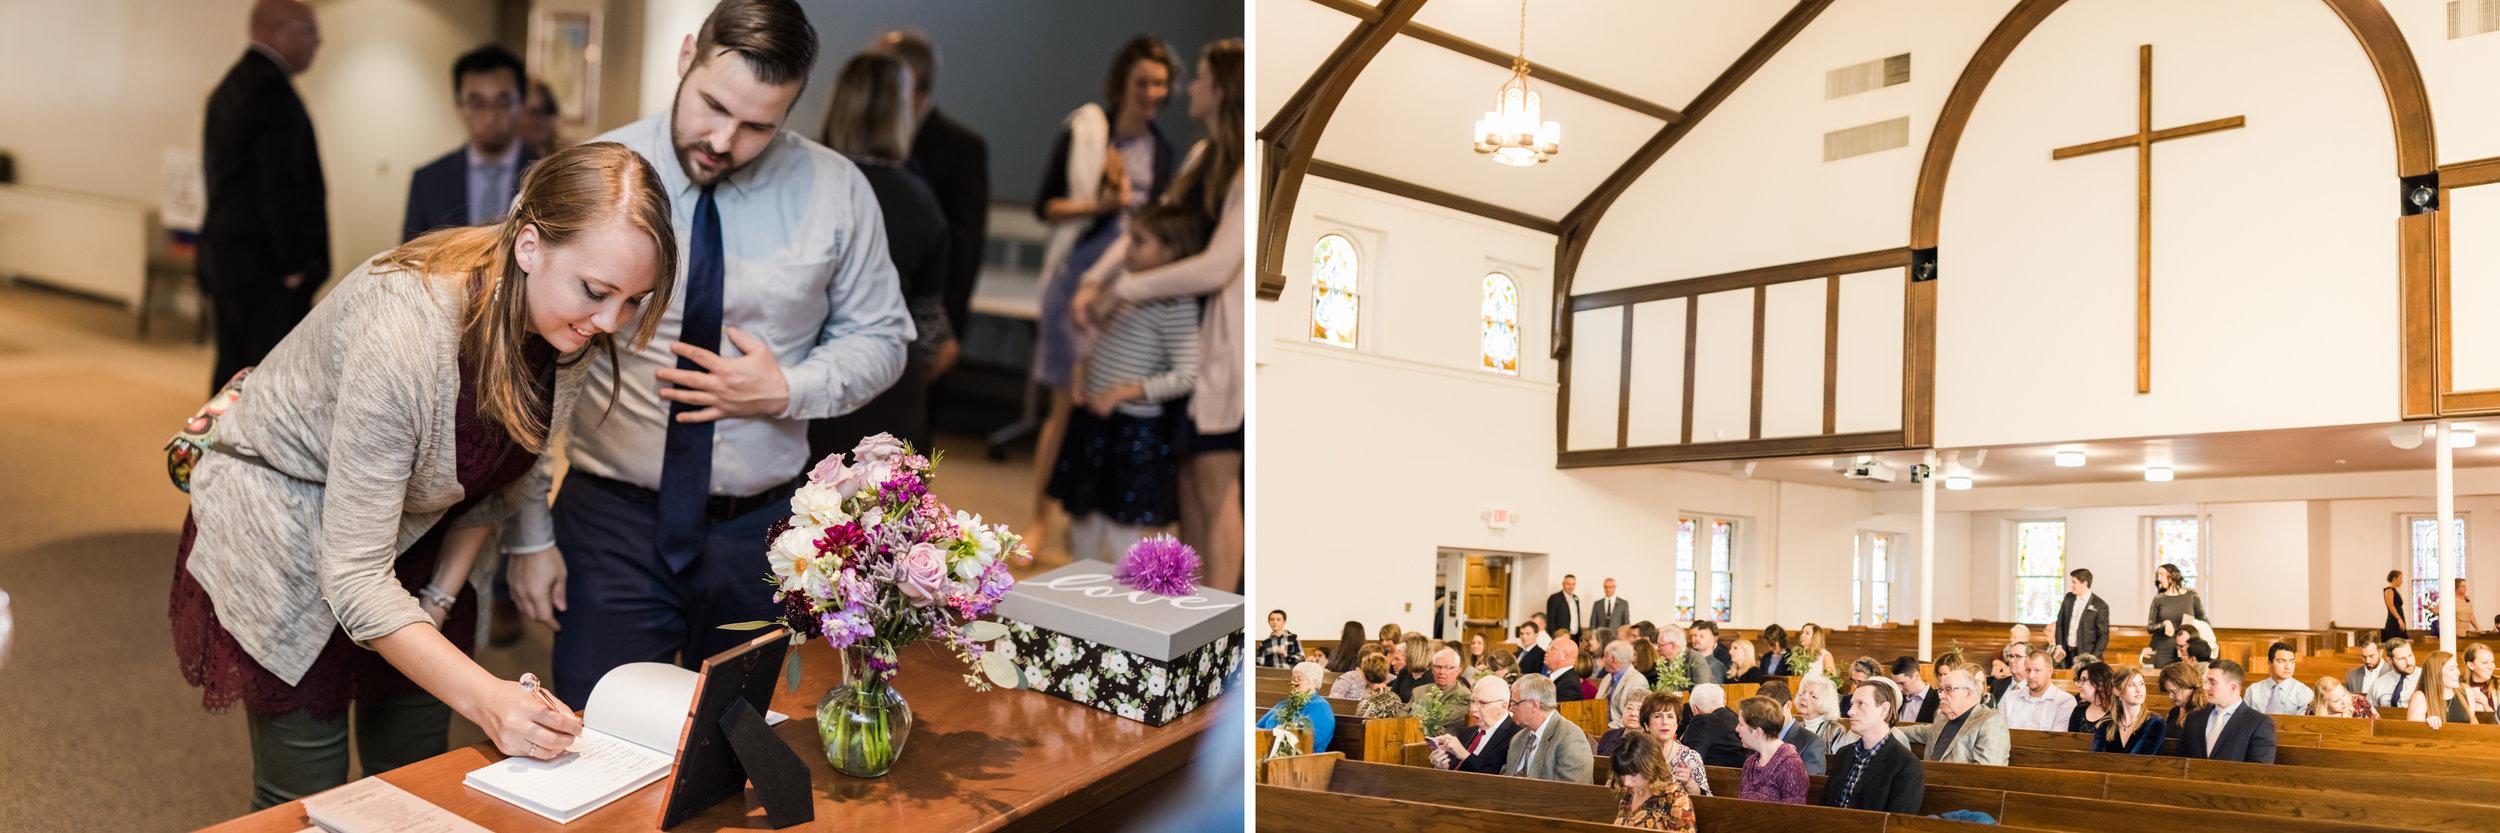 Lawrence Kansas Wedding United Methodist Church Ceremony.jpg